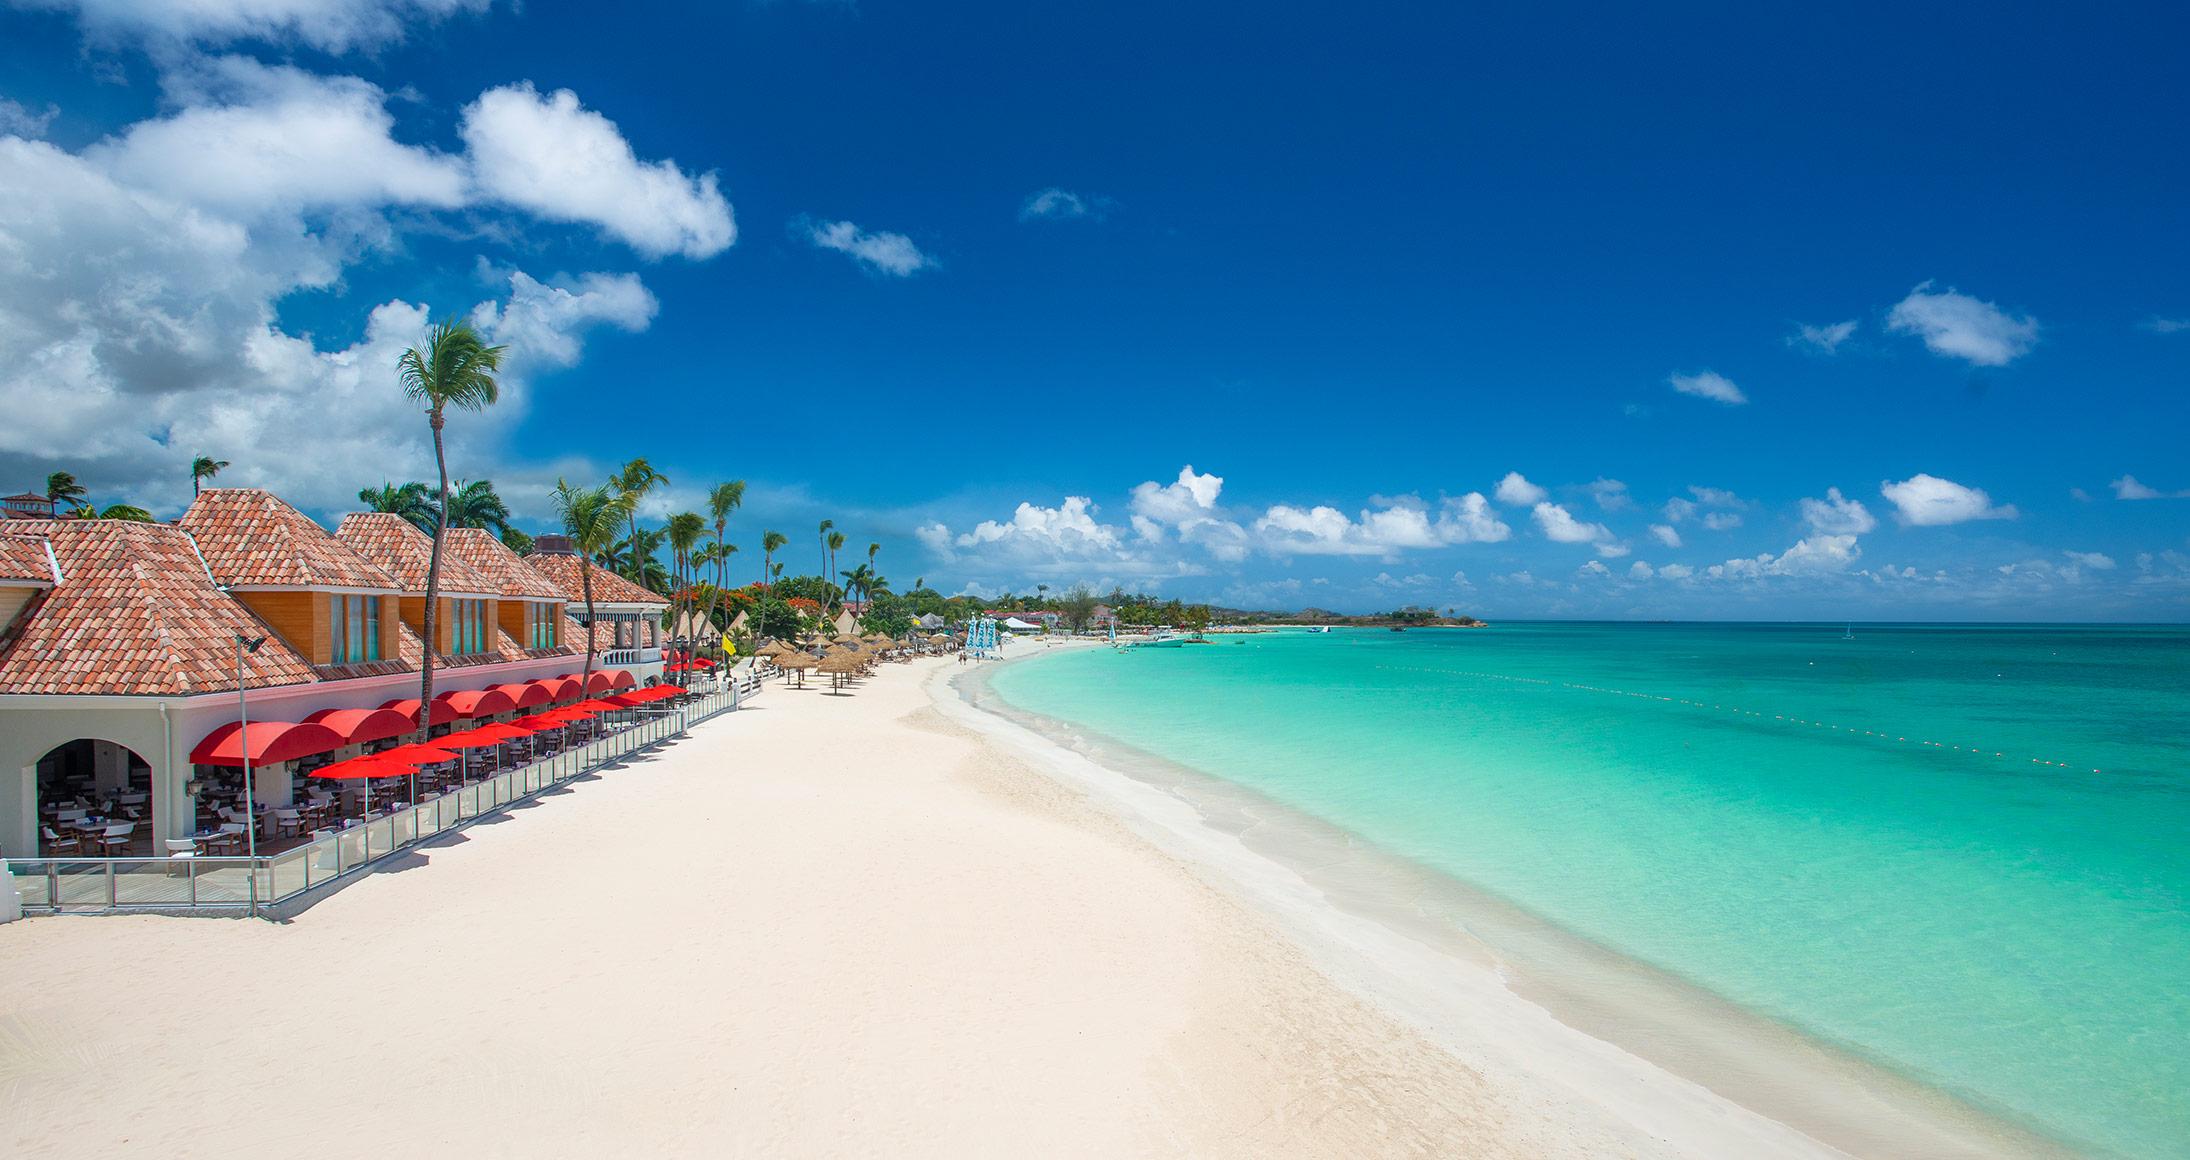 Sandals Grande Antigua  AllInclusive Luxury Resort in St Johns